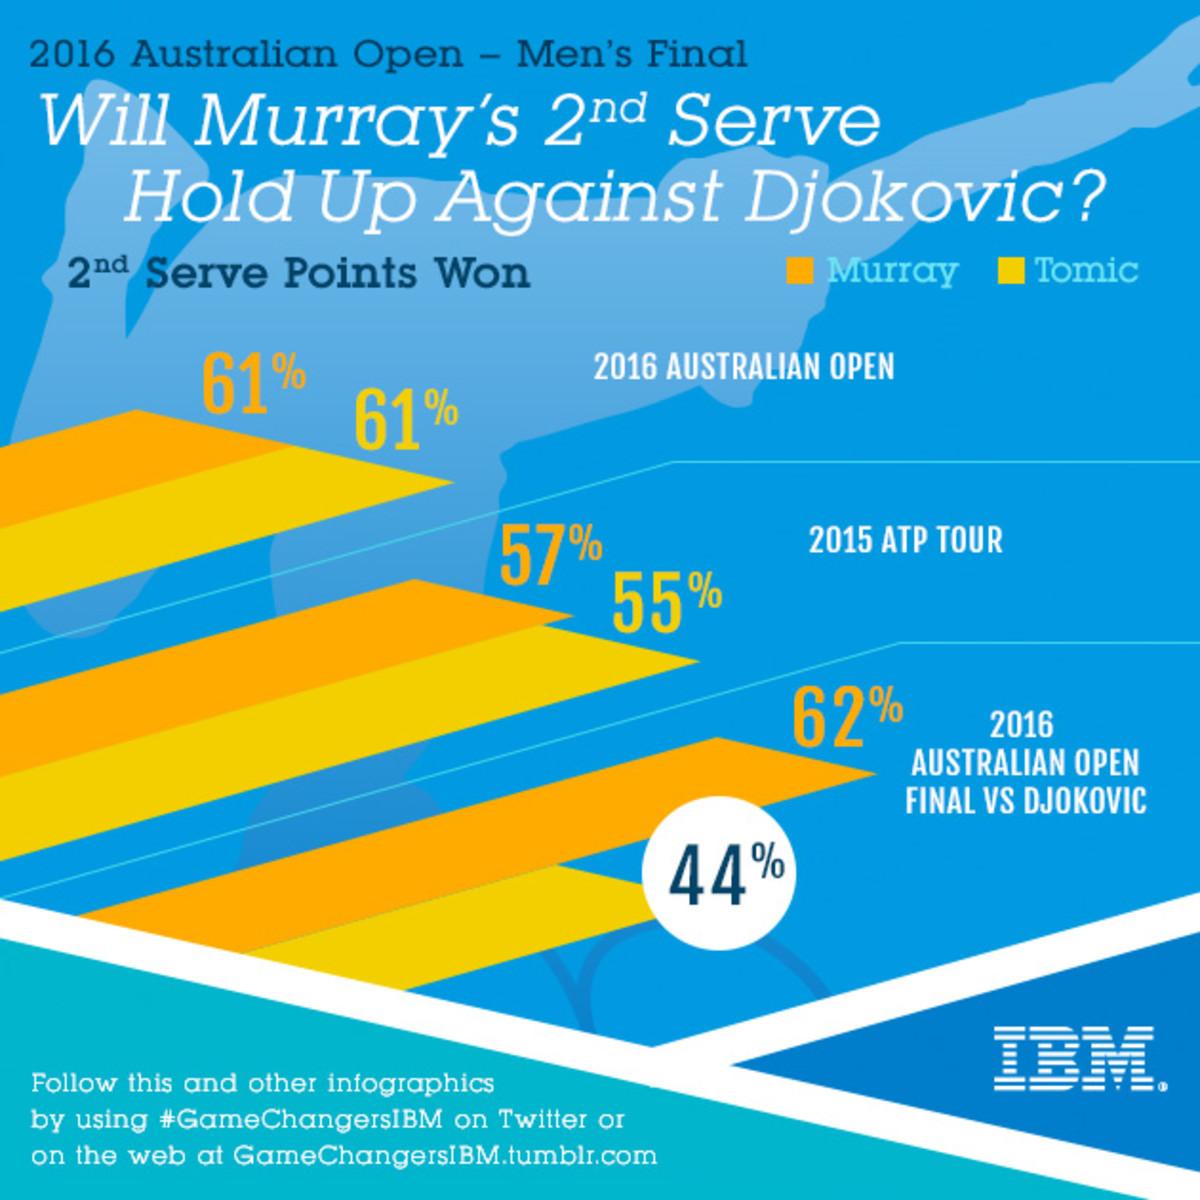 AO_27_Murray2ndServe_IG_v1.jpg.jpeg